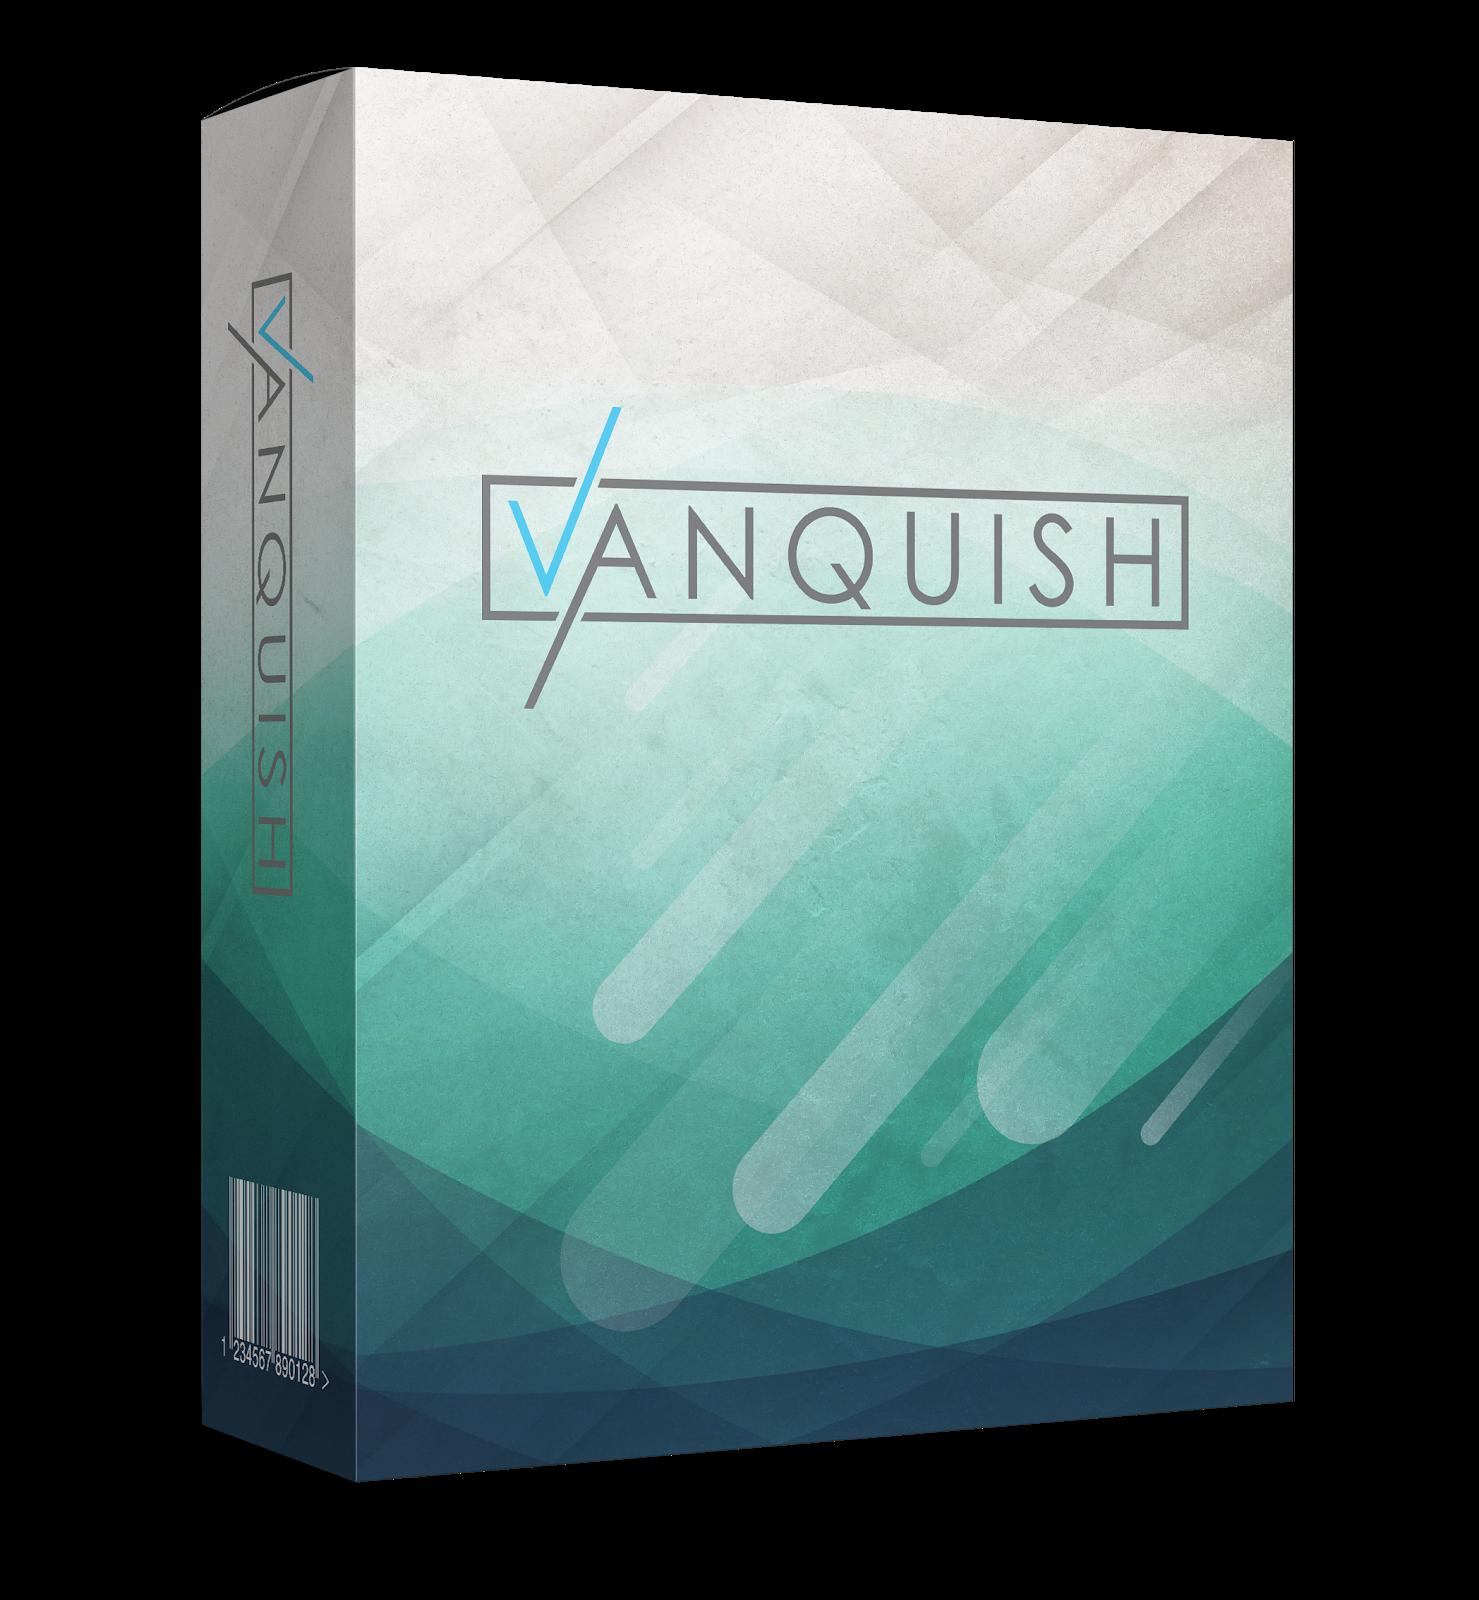 Vanquish Review Scam